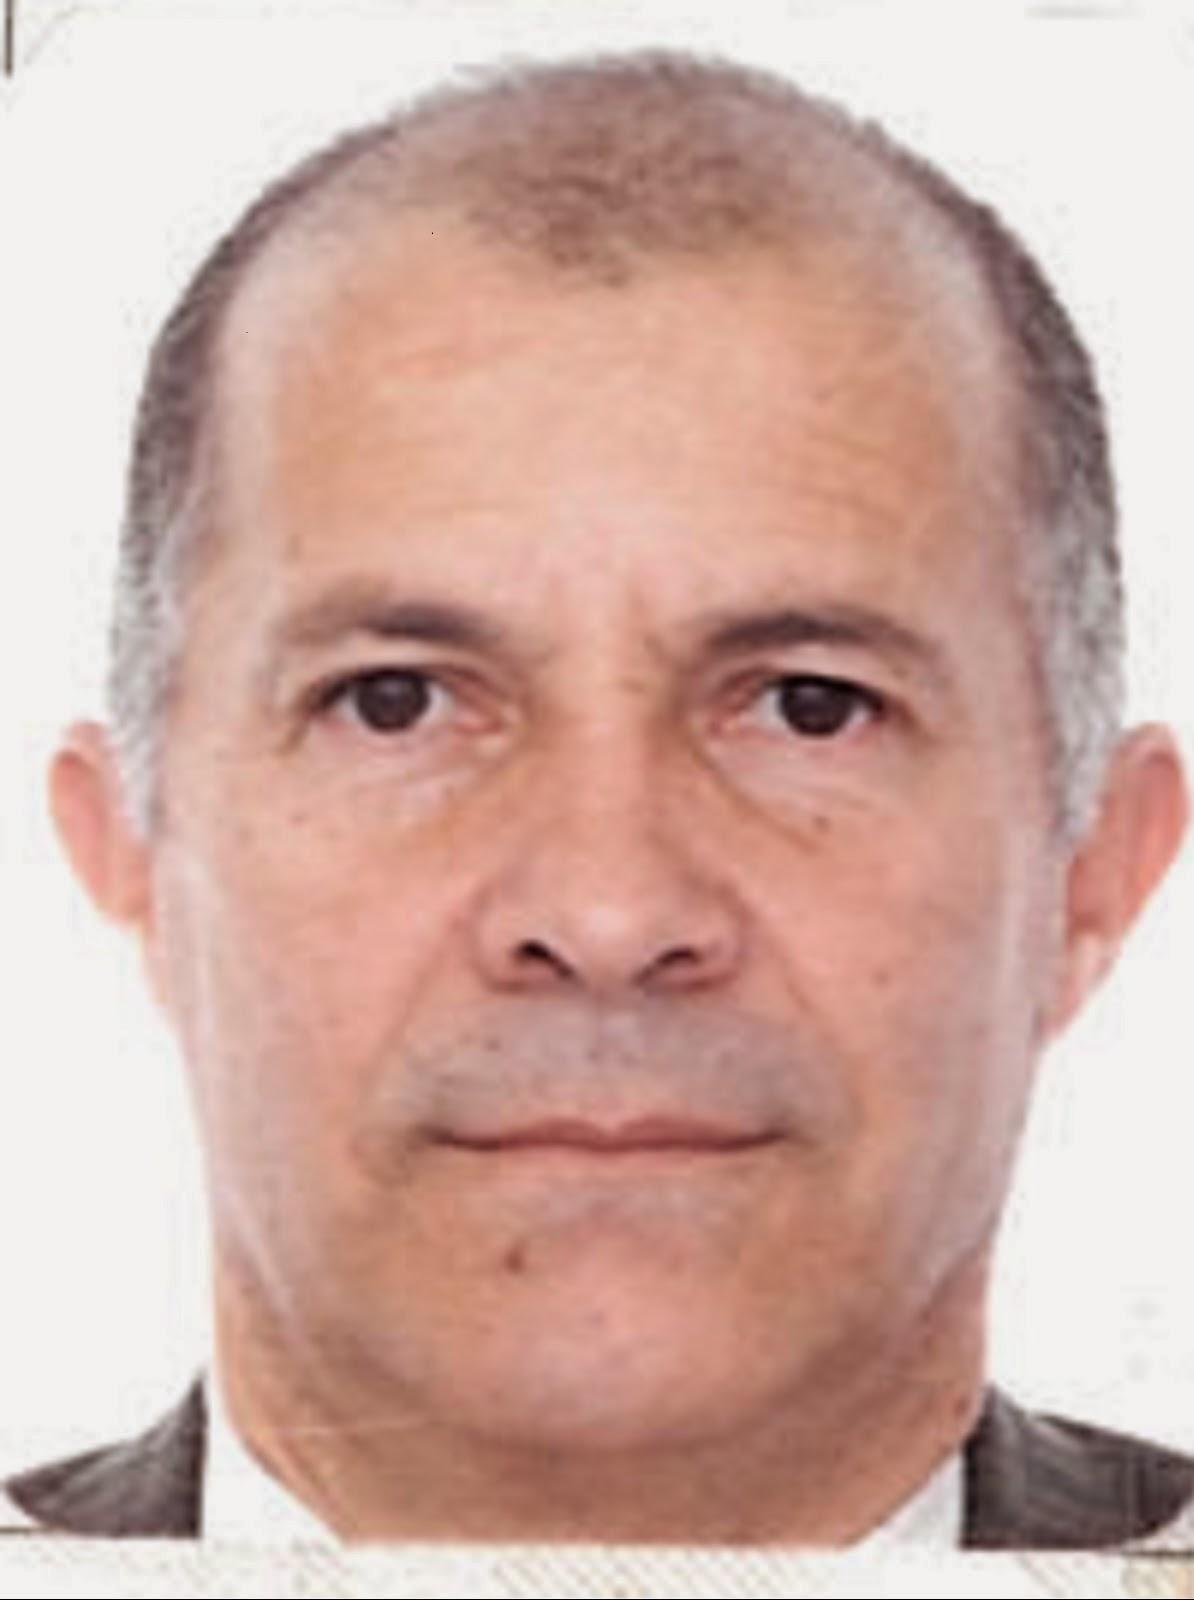 JURADO ALVARÁN, Jaime